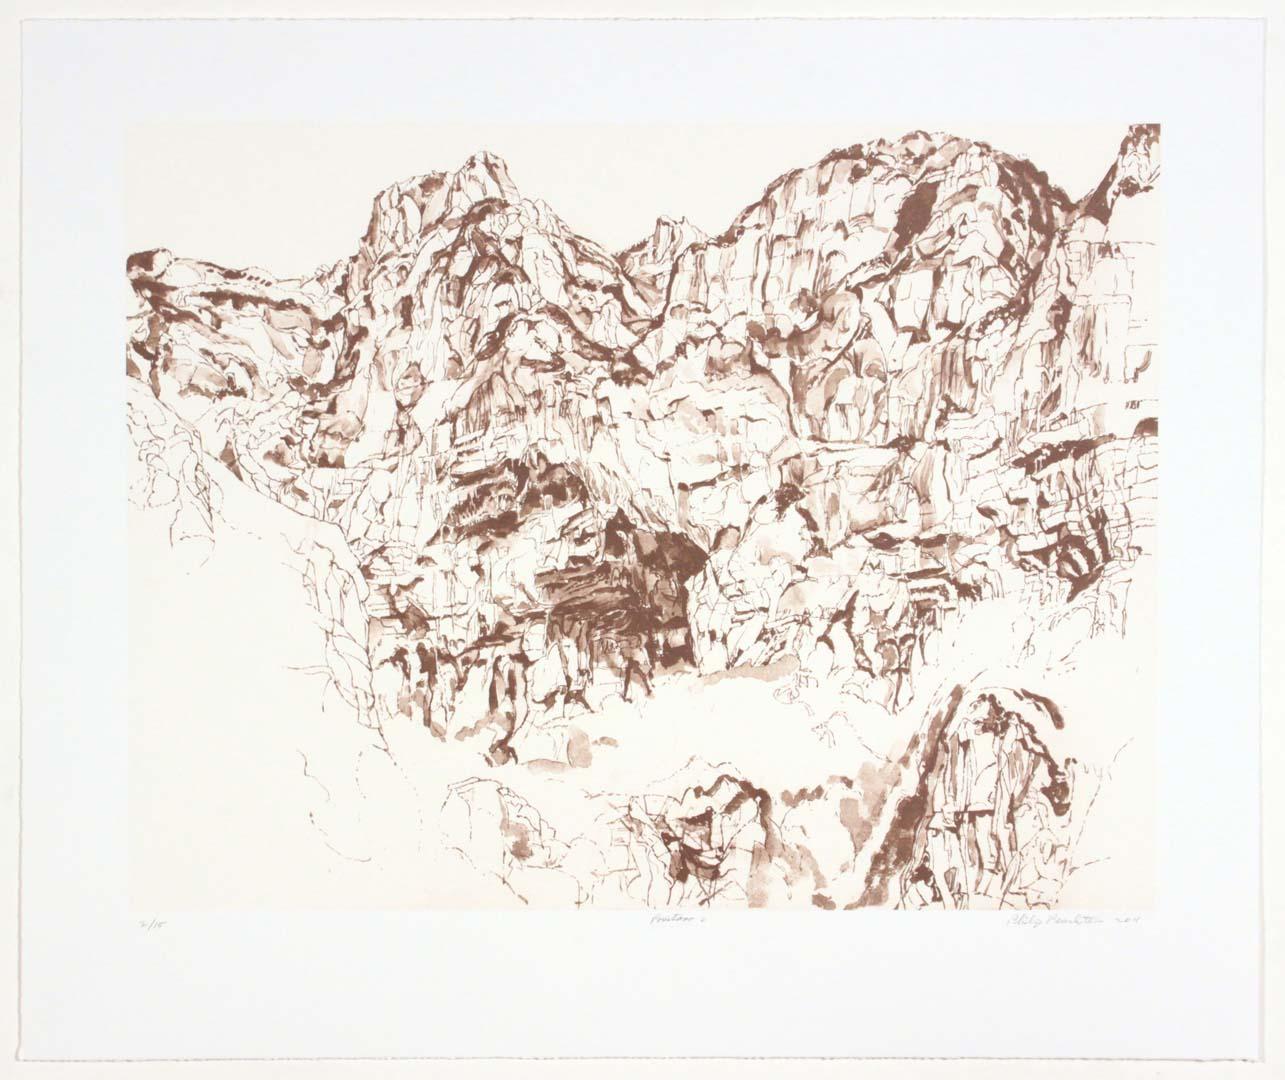 "2011 Positano #2 Lithograph on Paper 20.625"" x 24.625"""